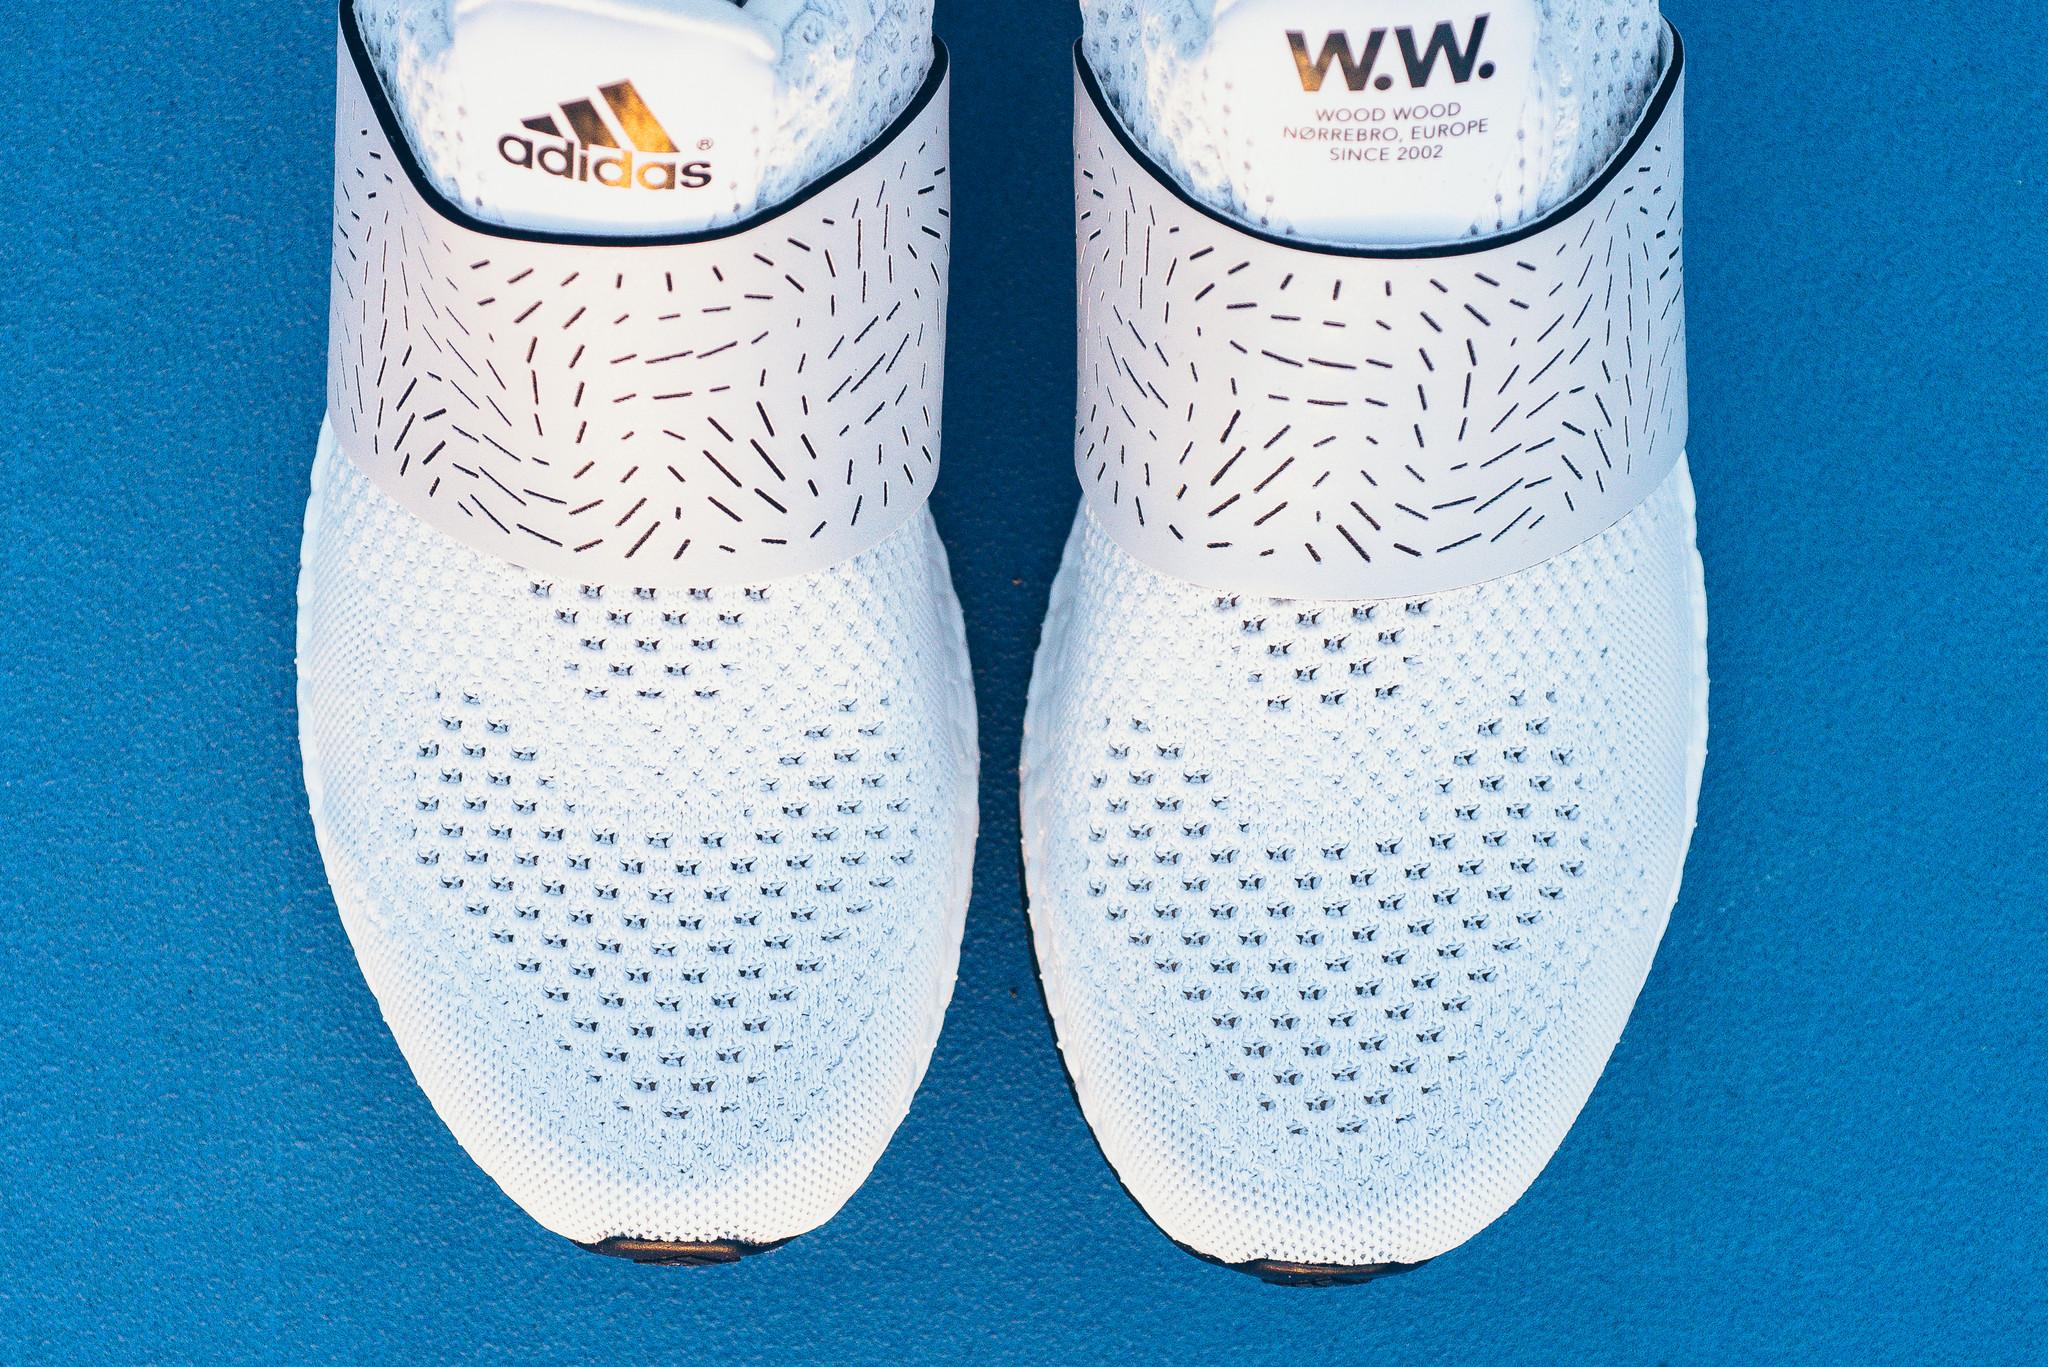 Adidas_x_Wood_Wood_Ultra_Boost_Smealer_Politics_Hypebeast_6